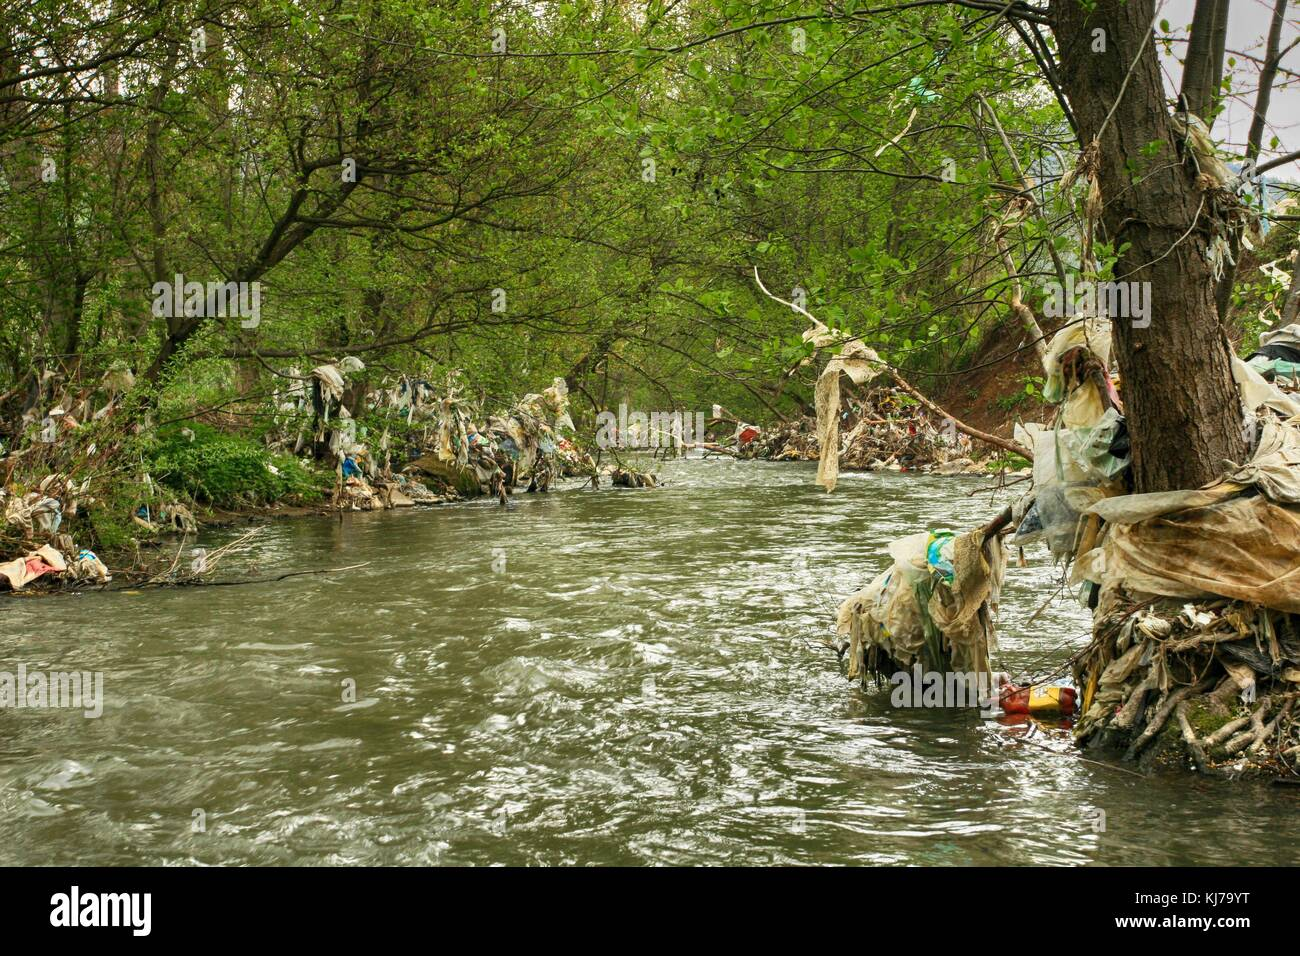 Plastic polluted Raska River in Serbia, Europe - Stock Image